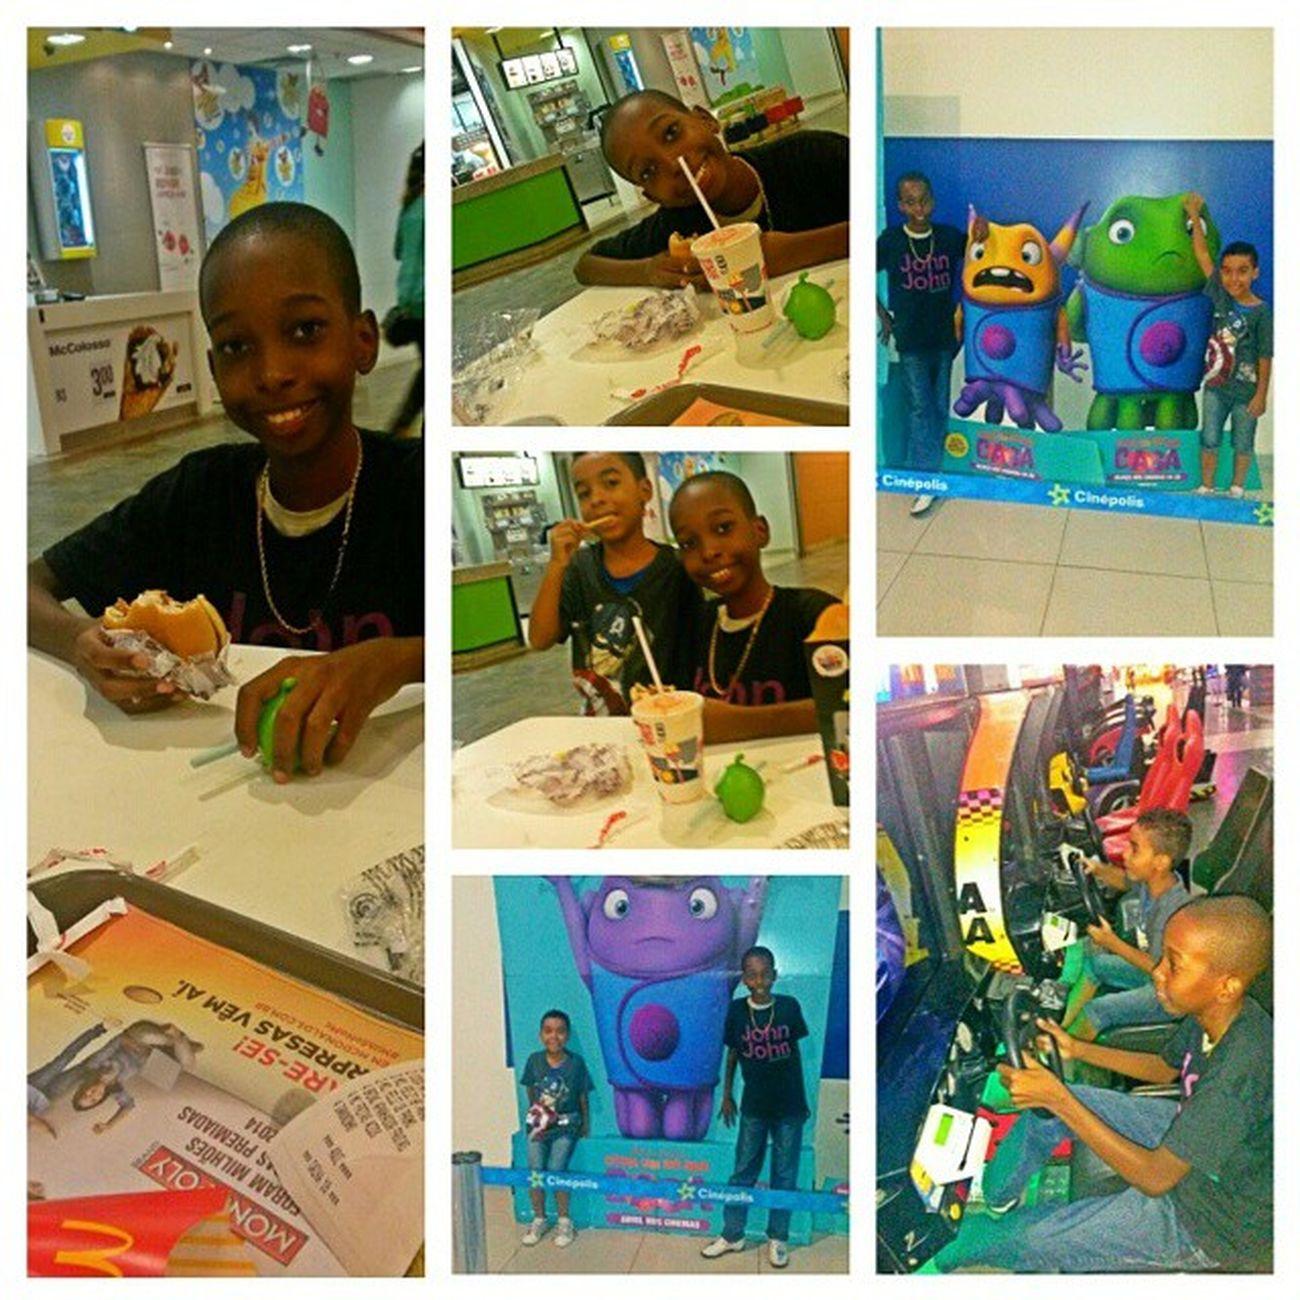 Amores😍😍 Cinema 🎬🎥 Playtoy 🎮 McDonald 's 🍔🍟 Instasize